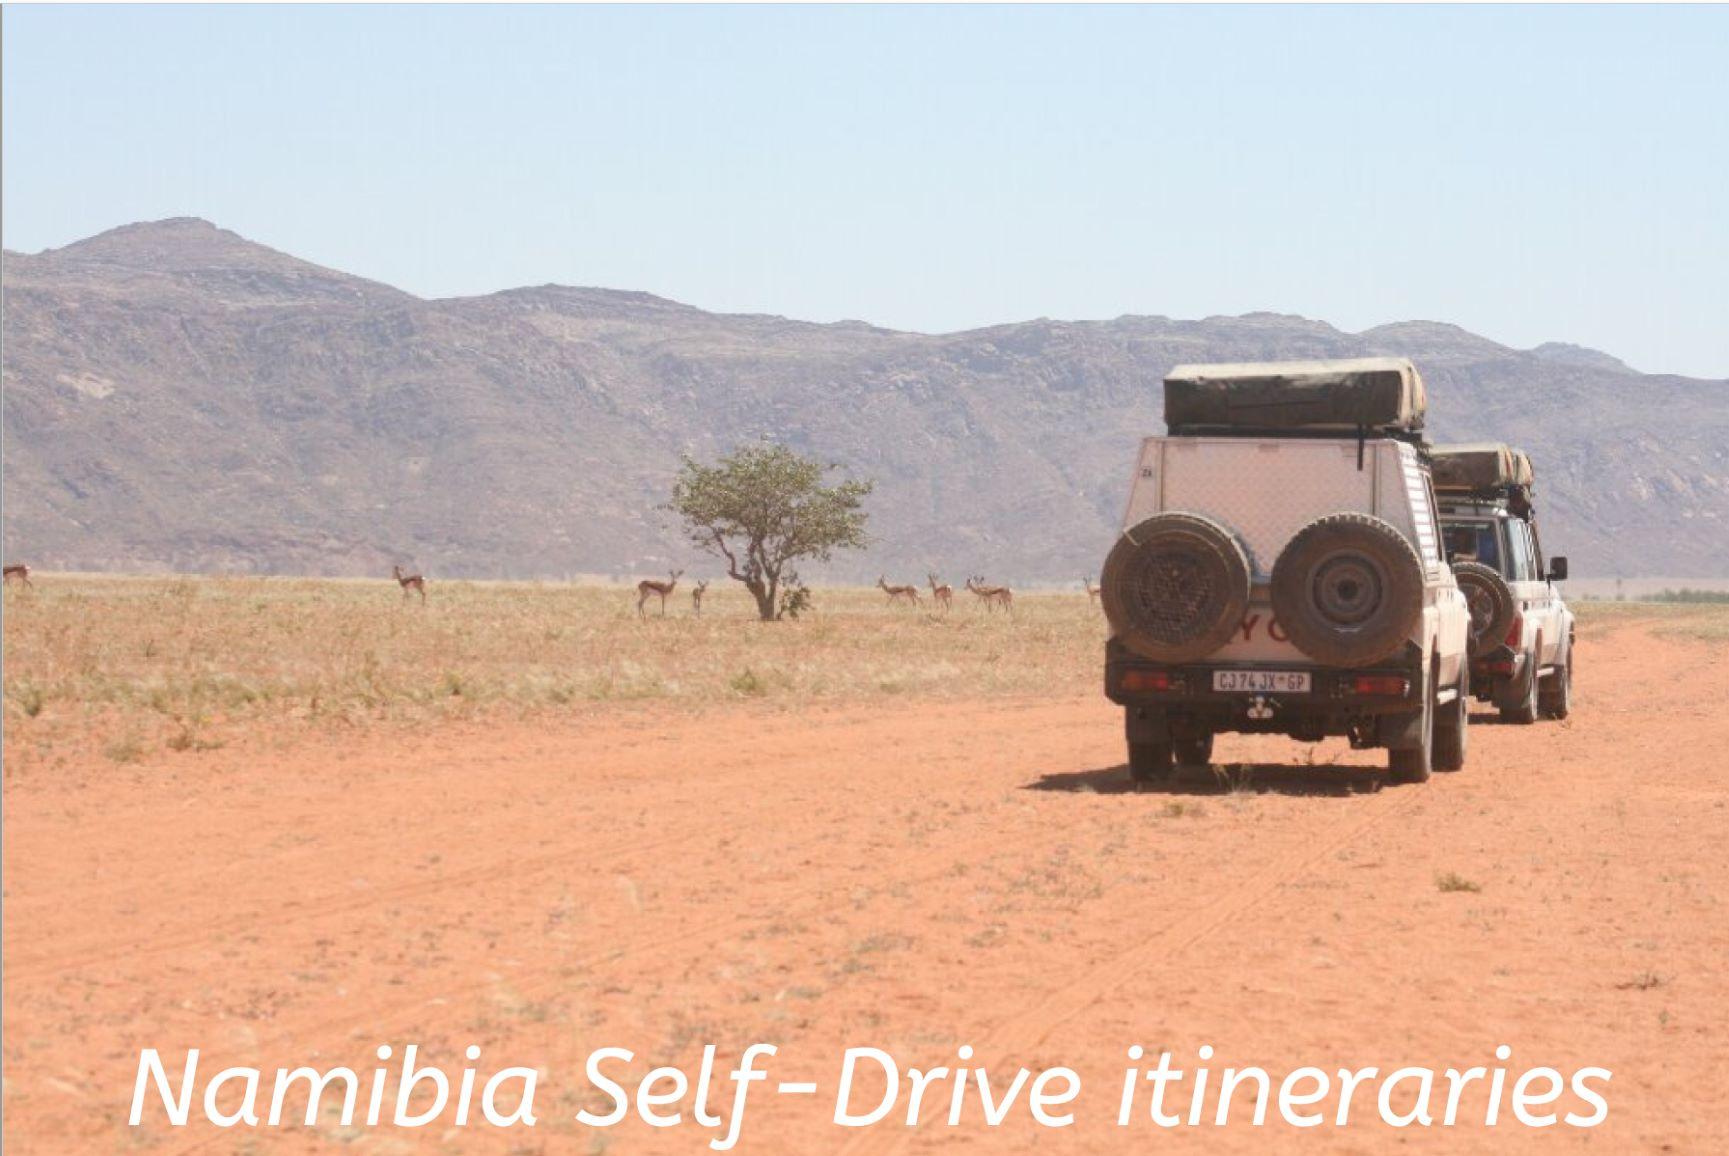 Namibia self-drive itineraries